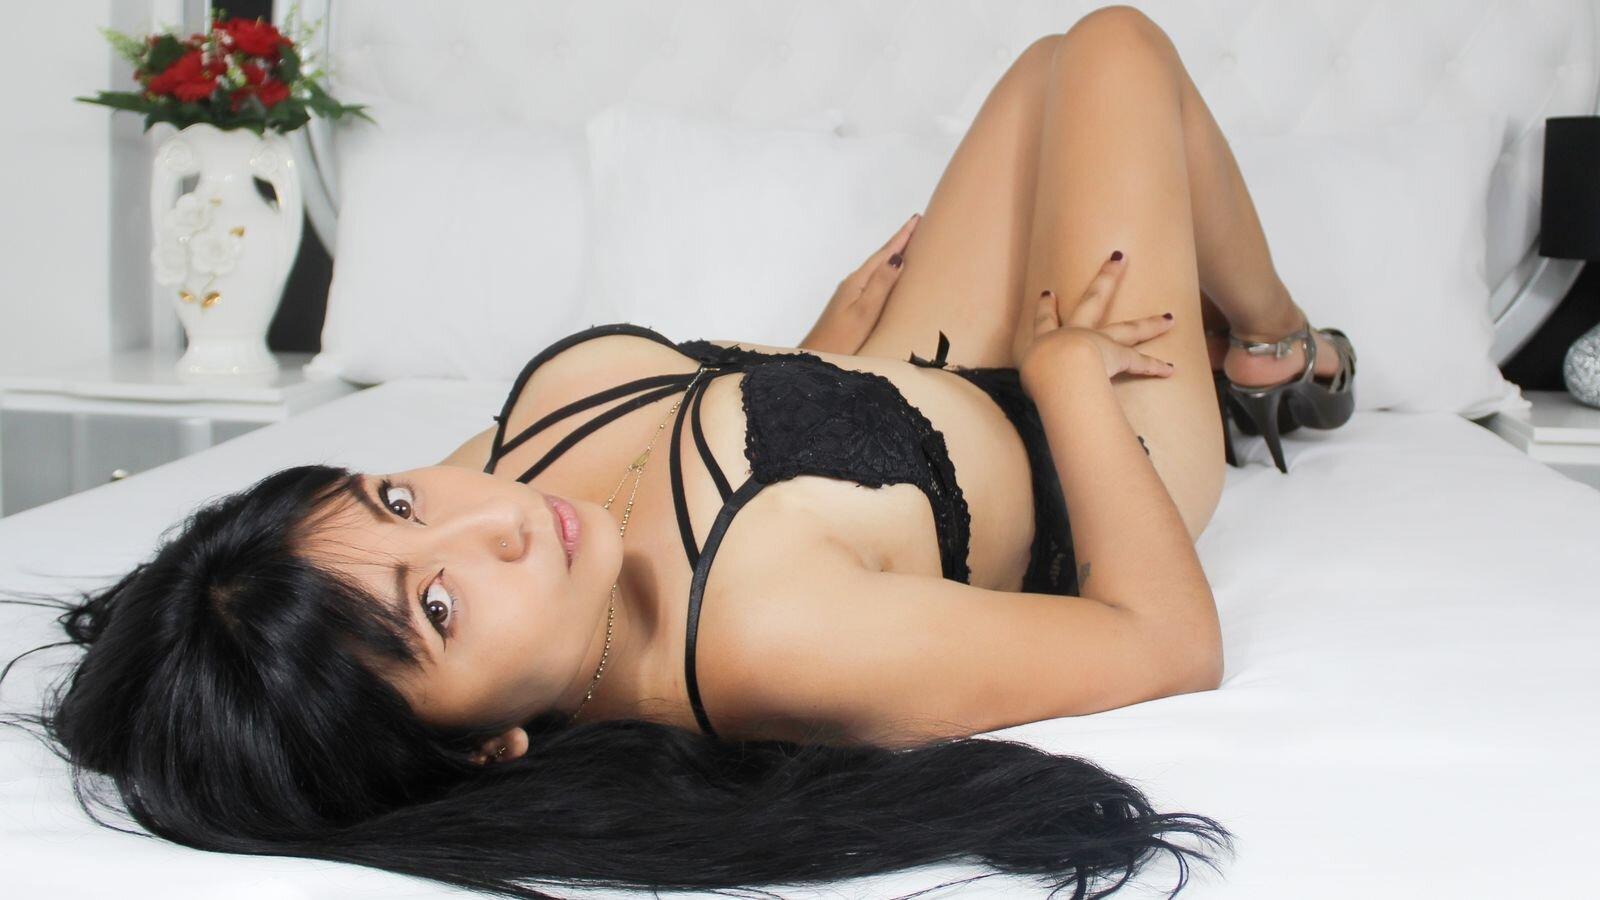 CamilaTyler